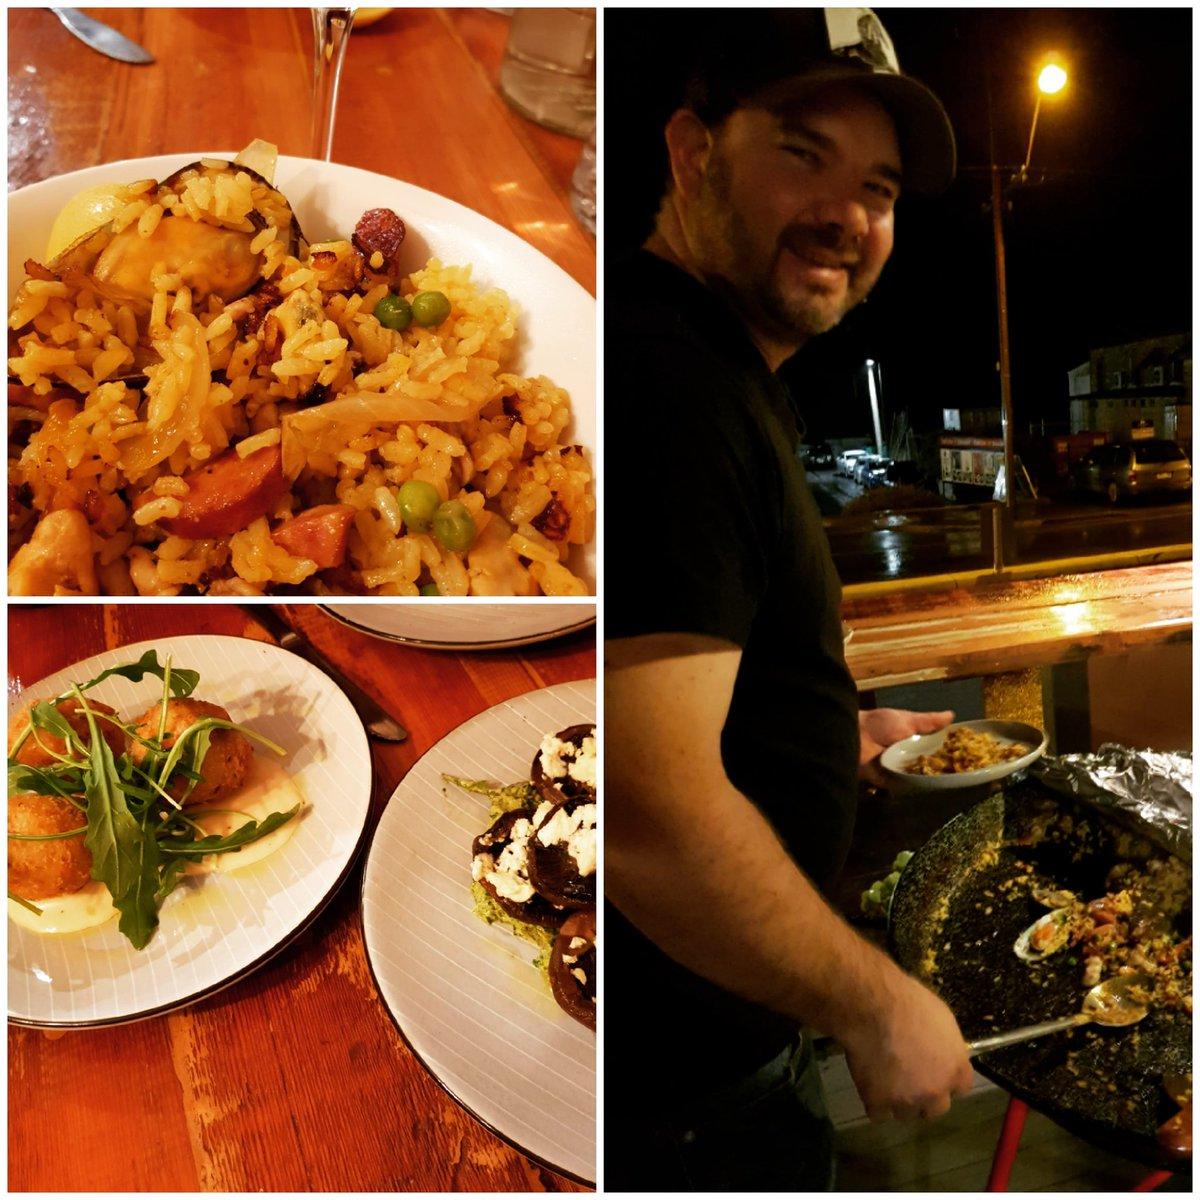 #adelaidehills #hornetsnestcafe #littlehampton #fridaynightpaella  #mountbarker #ilovethehills @LoveSAdelaide @FoodSouthAus  Just good food Friday night's yum